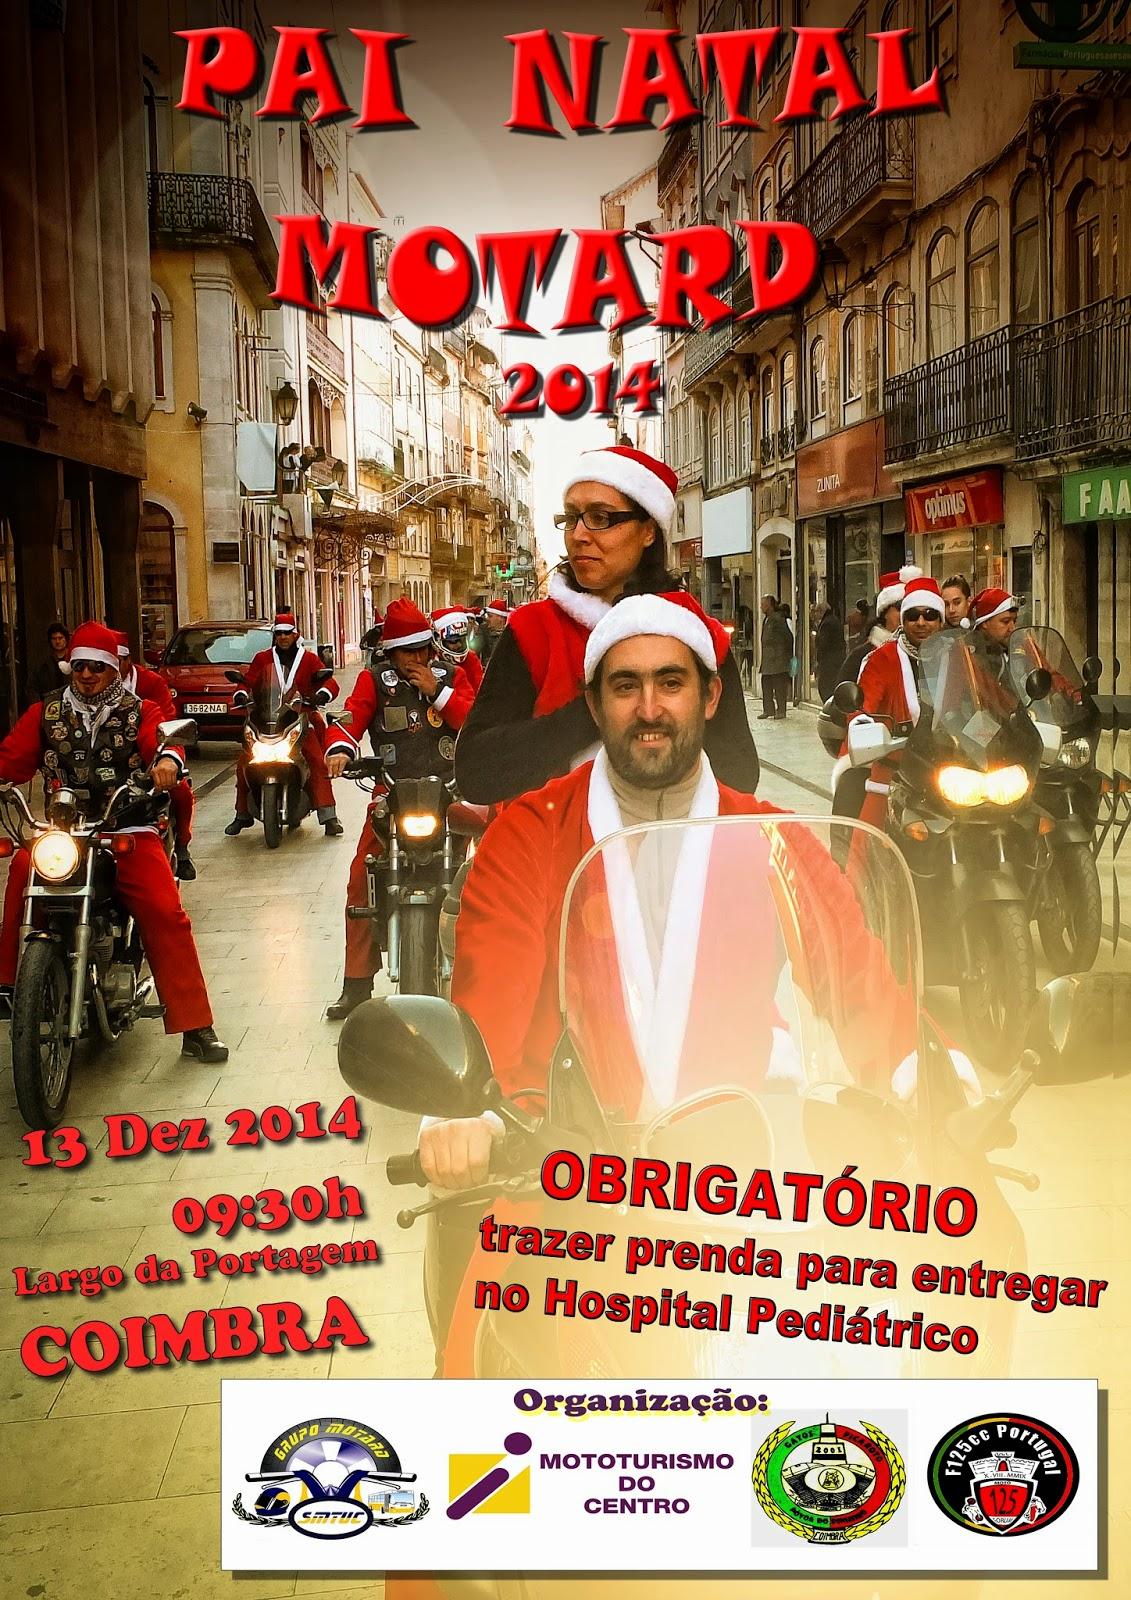 Desfile Pai Natal Motard 2014-Coimbra Cartaz%2BPai%2BNatal%2BMotard_2014_net